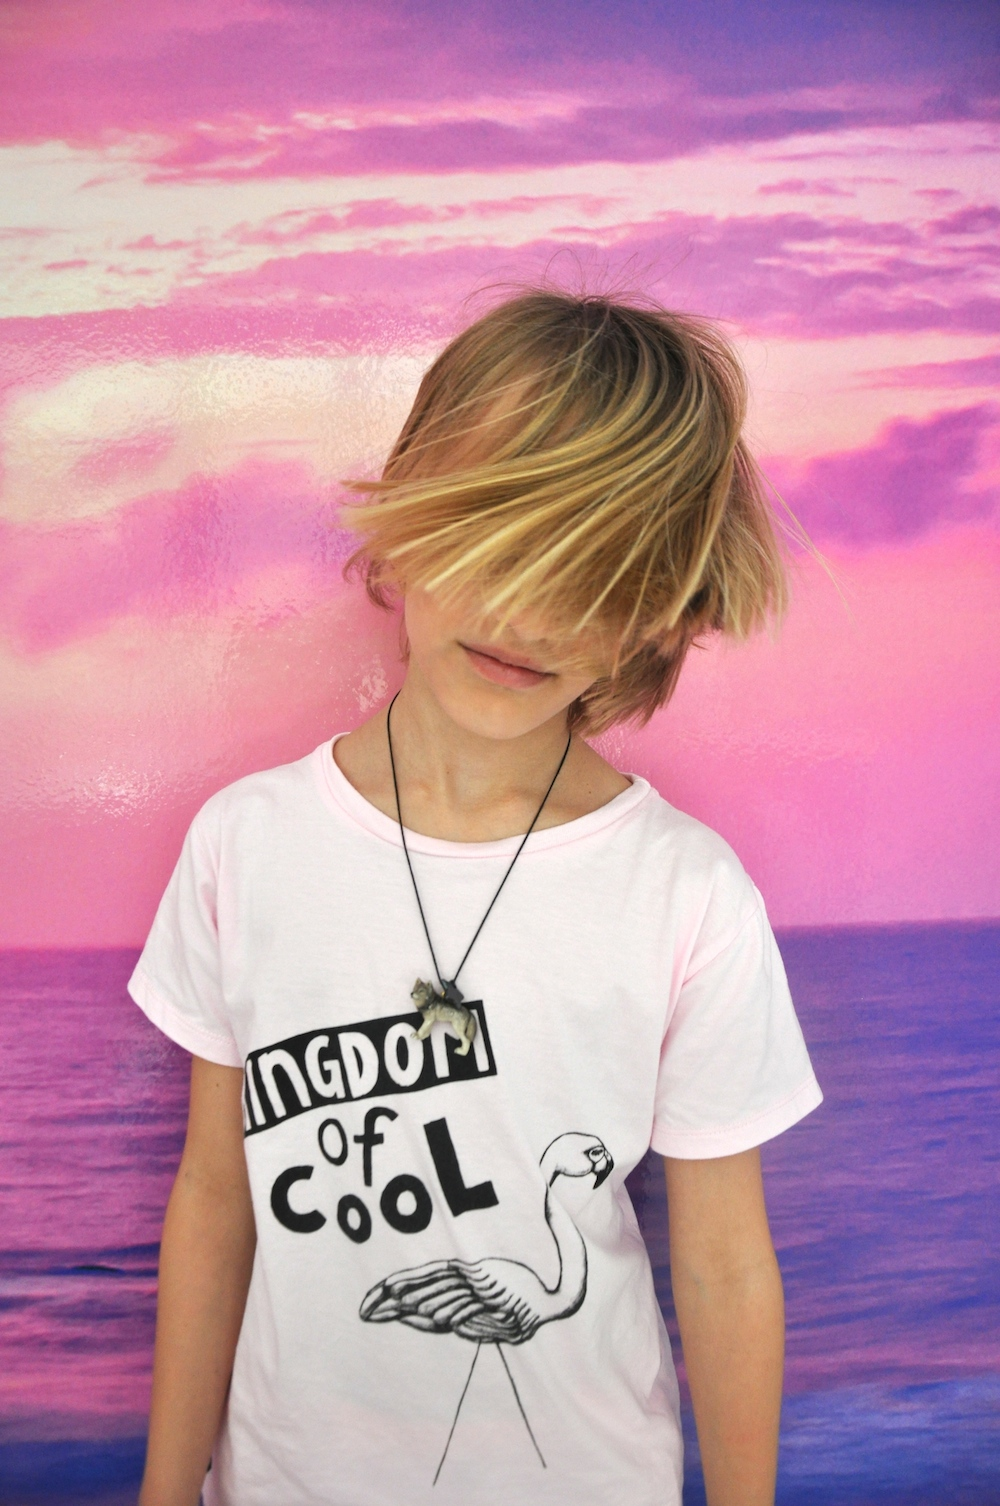 kingdom_cool_tshirt_monkey_mccoy_a_mini_penny